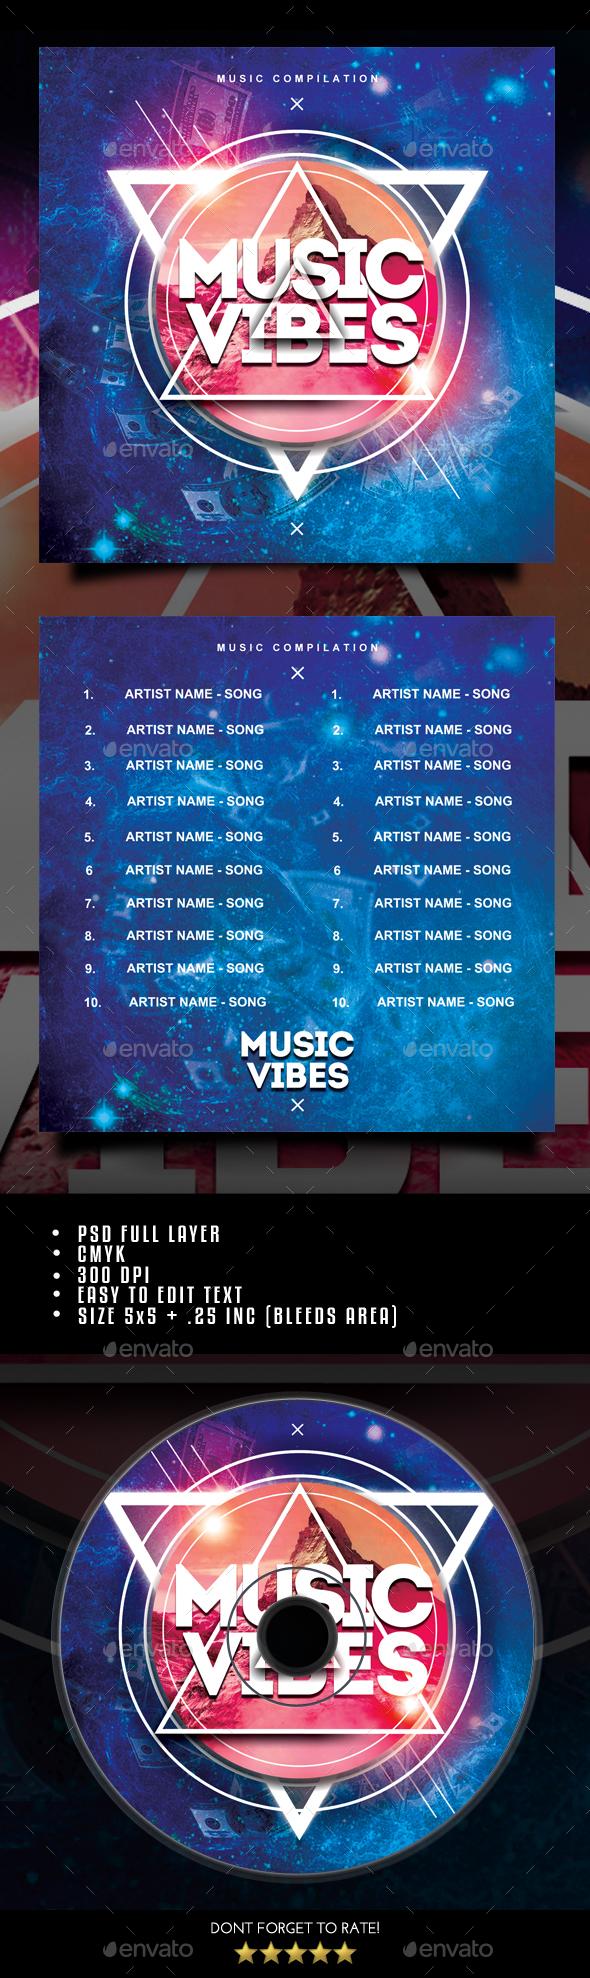 Music Vibes CD Cover - CD & DVD Artwork Print Templates